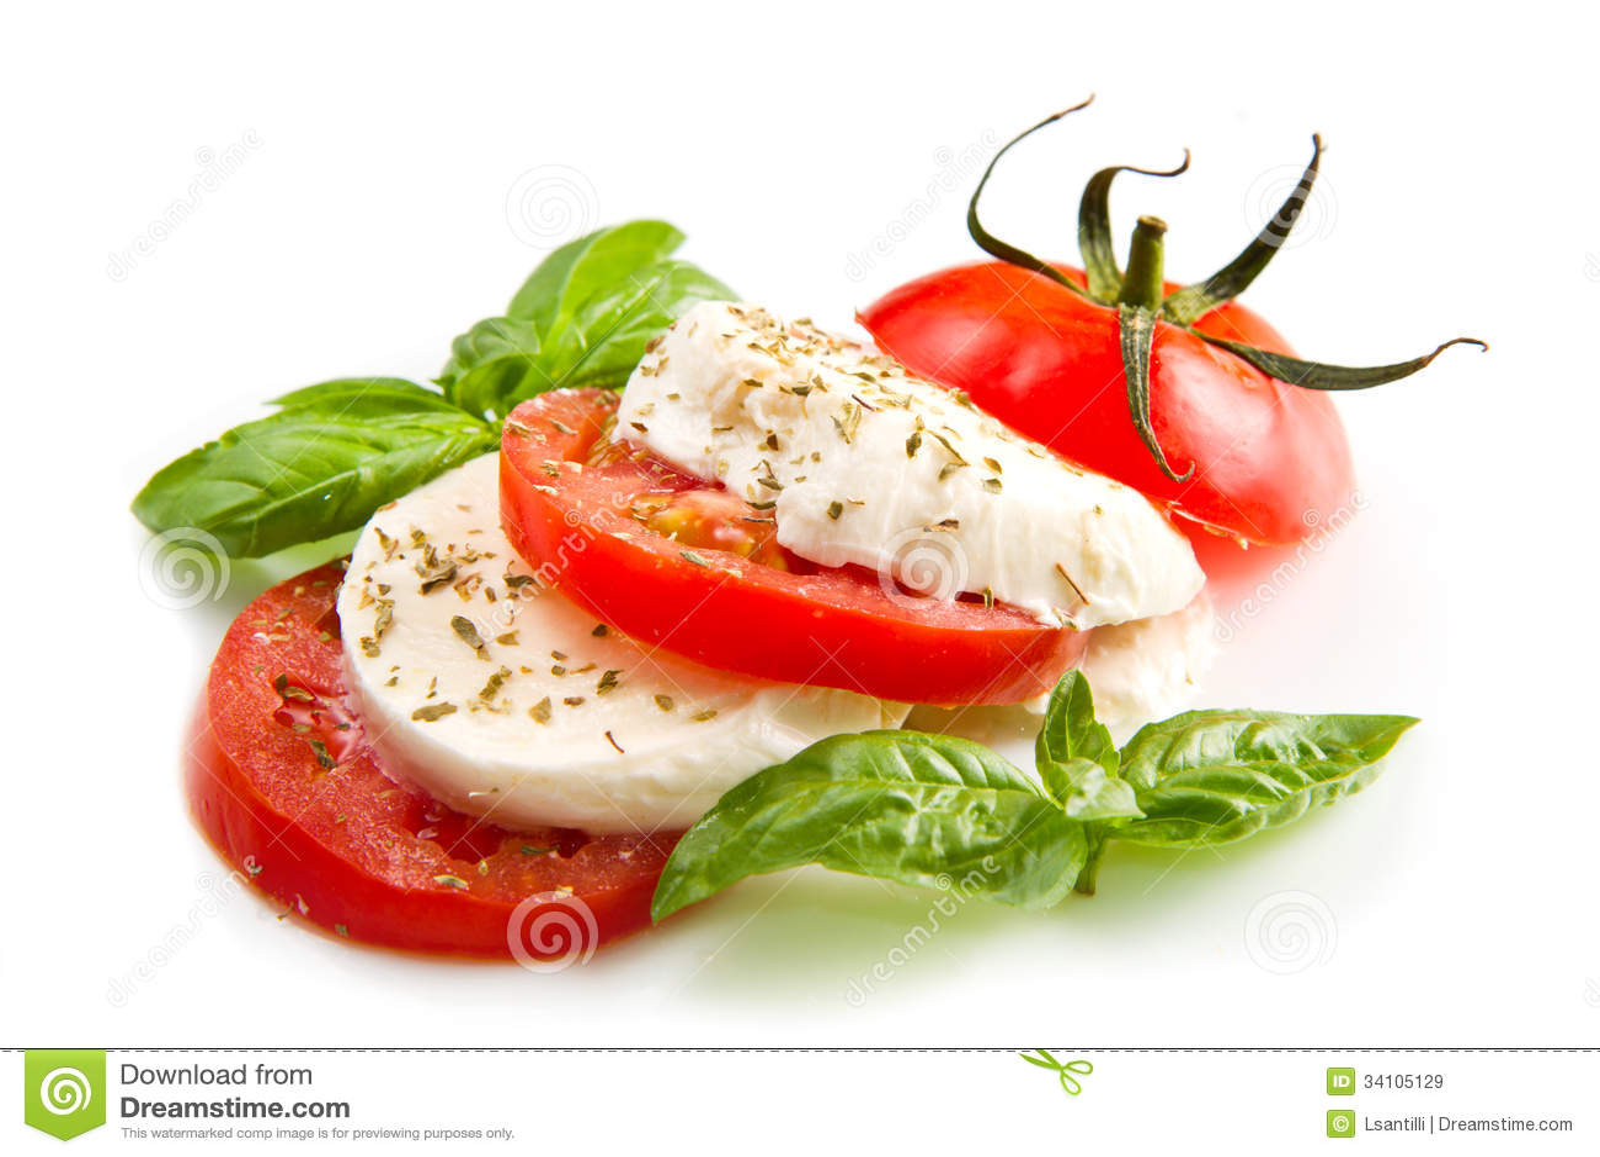 basilic de tomates de mozzarella sur un fond blanc images libres de droits image 34105129. Black Bedroom Furniture Sets. Home Design Ideas